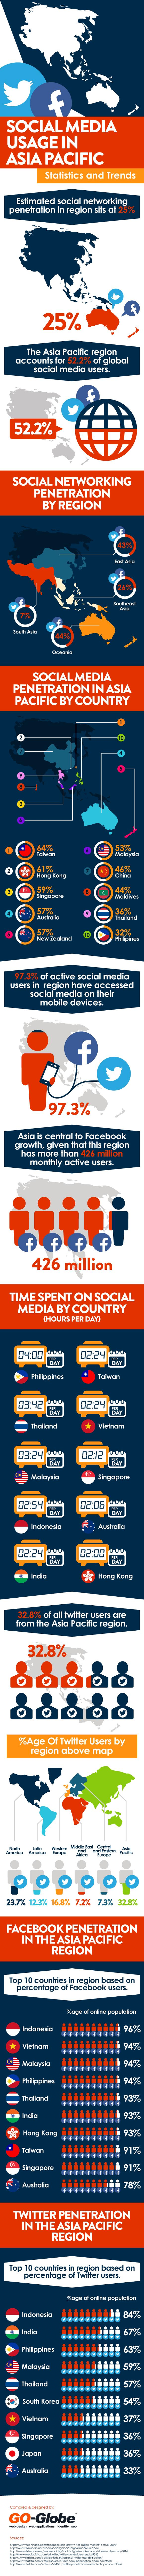 social-media-usage-in-asia_54c891fd0326f